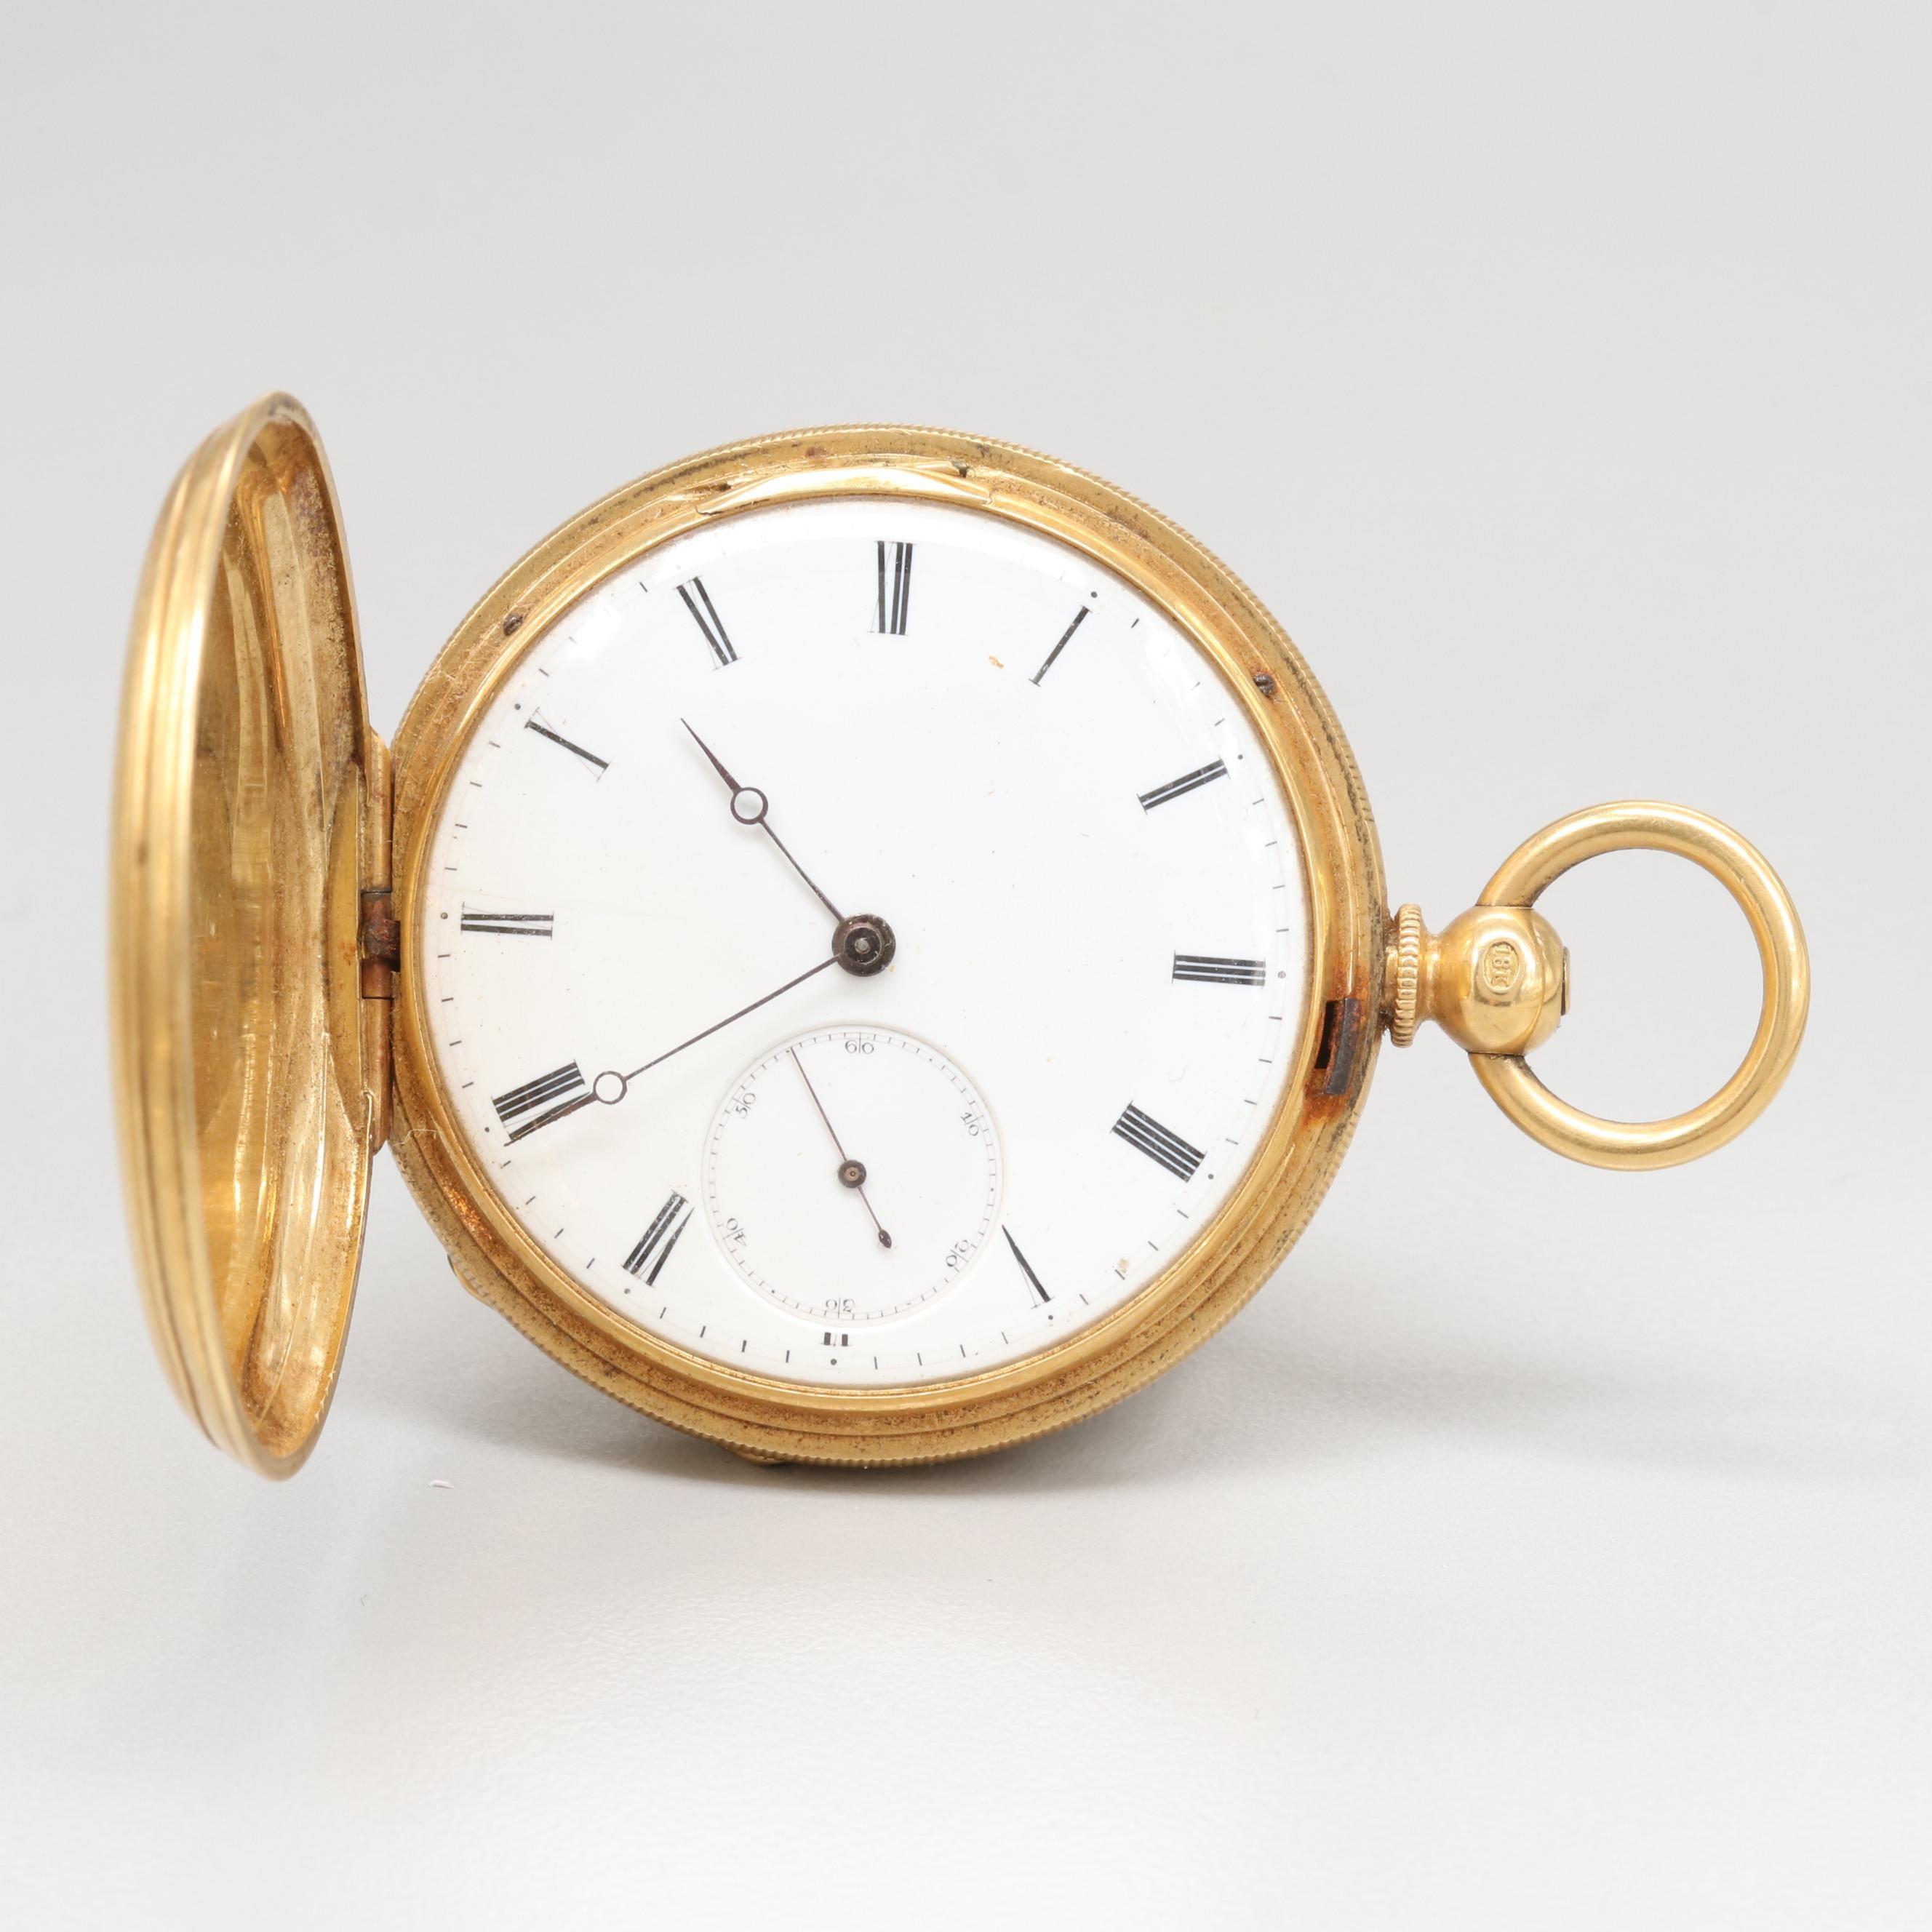 18K Yellow Gold Hunting Case Key Wind and Set Pocket Watch Circa 1905